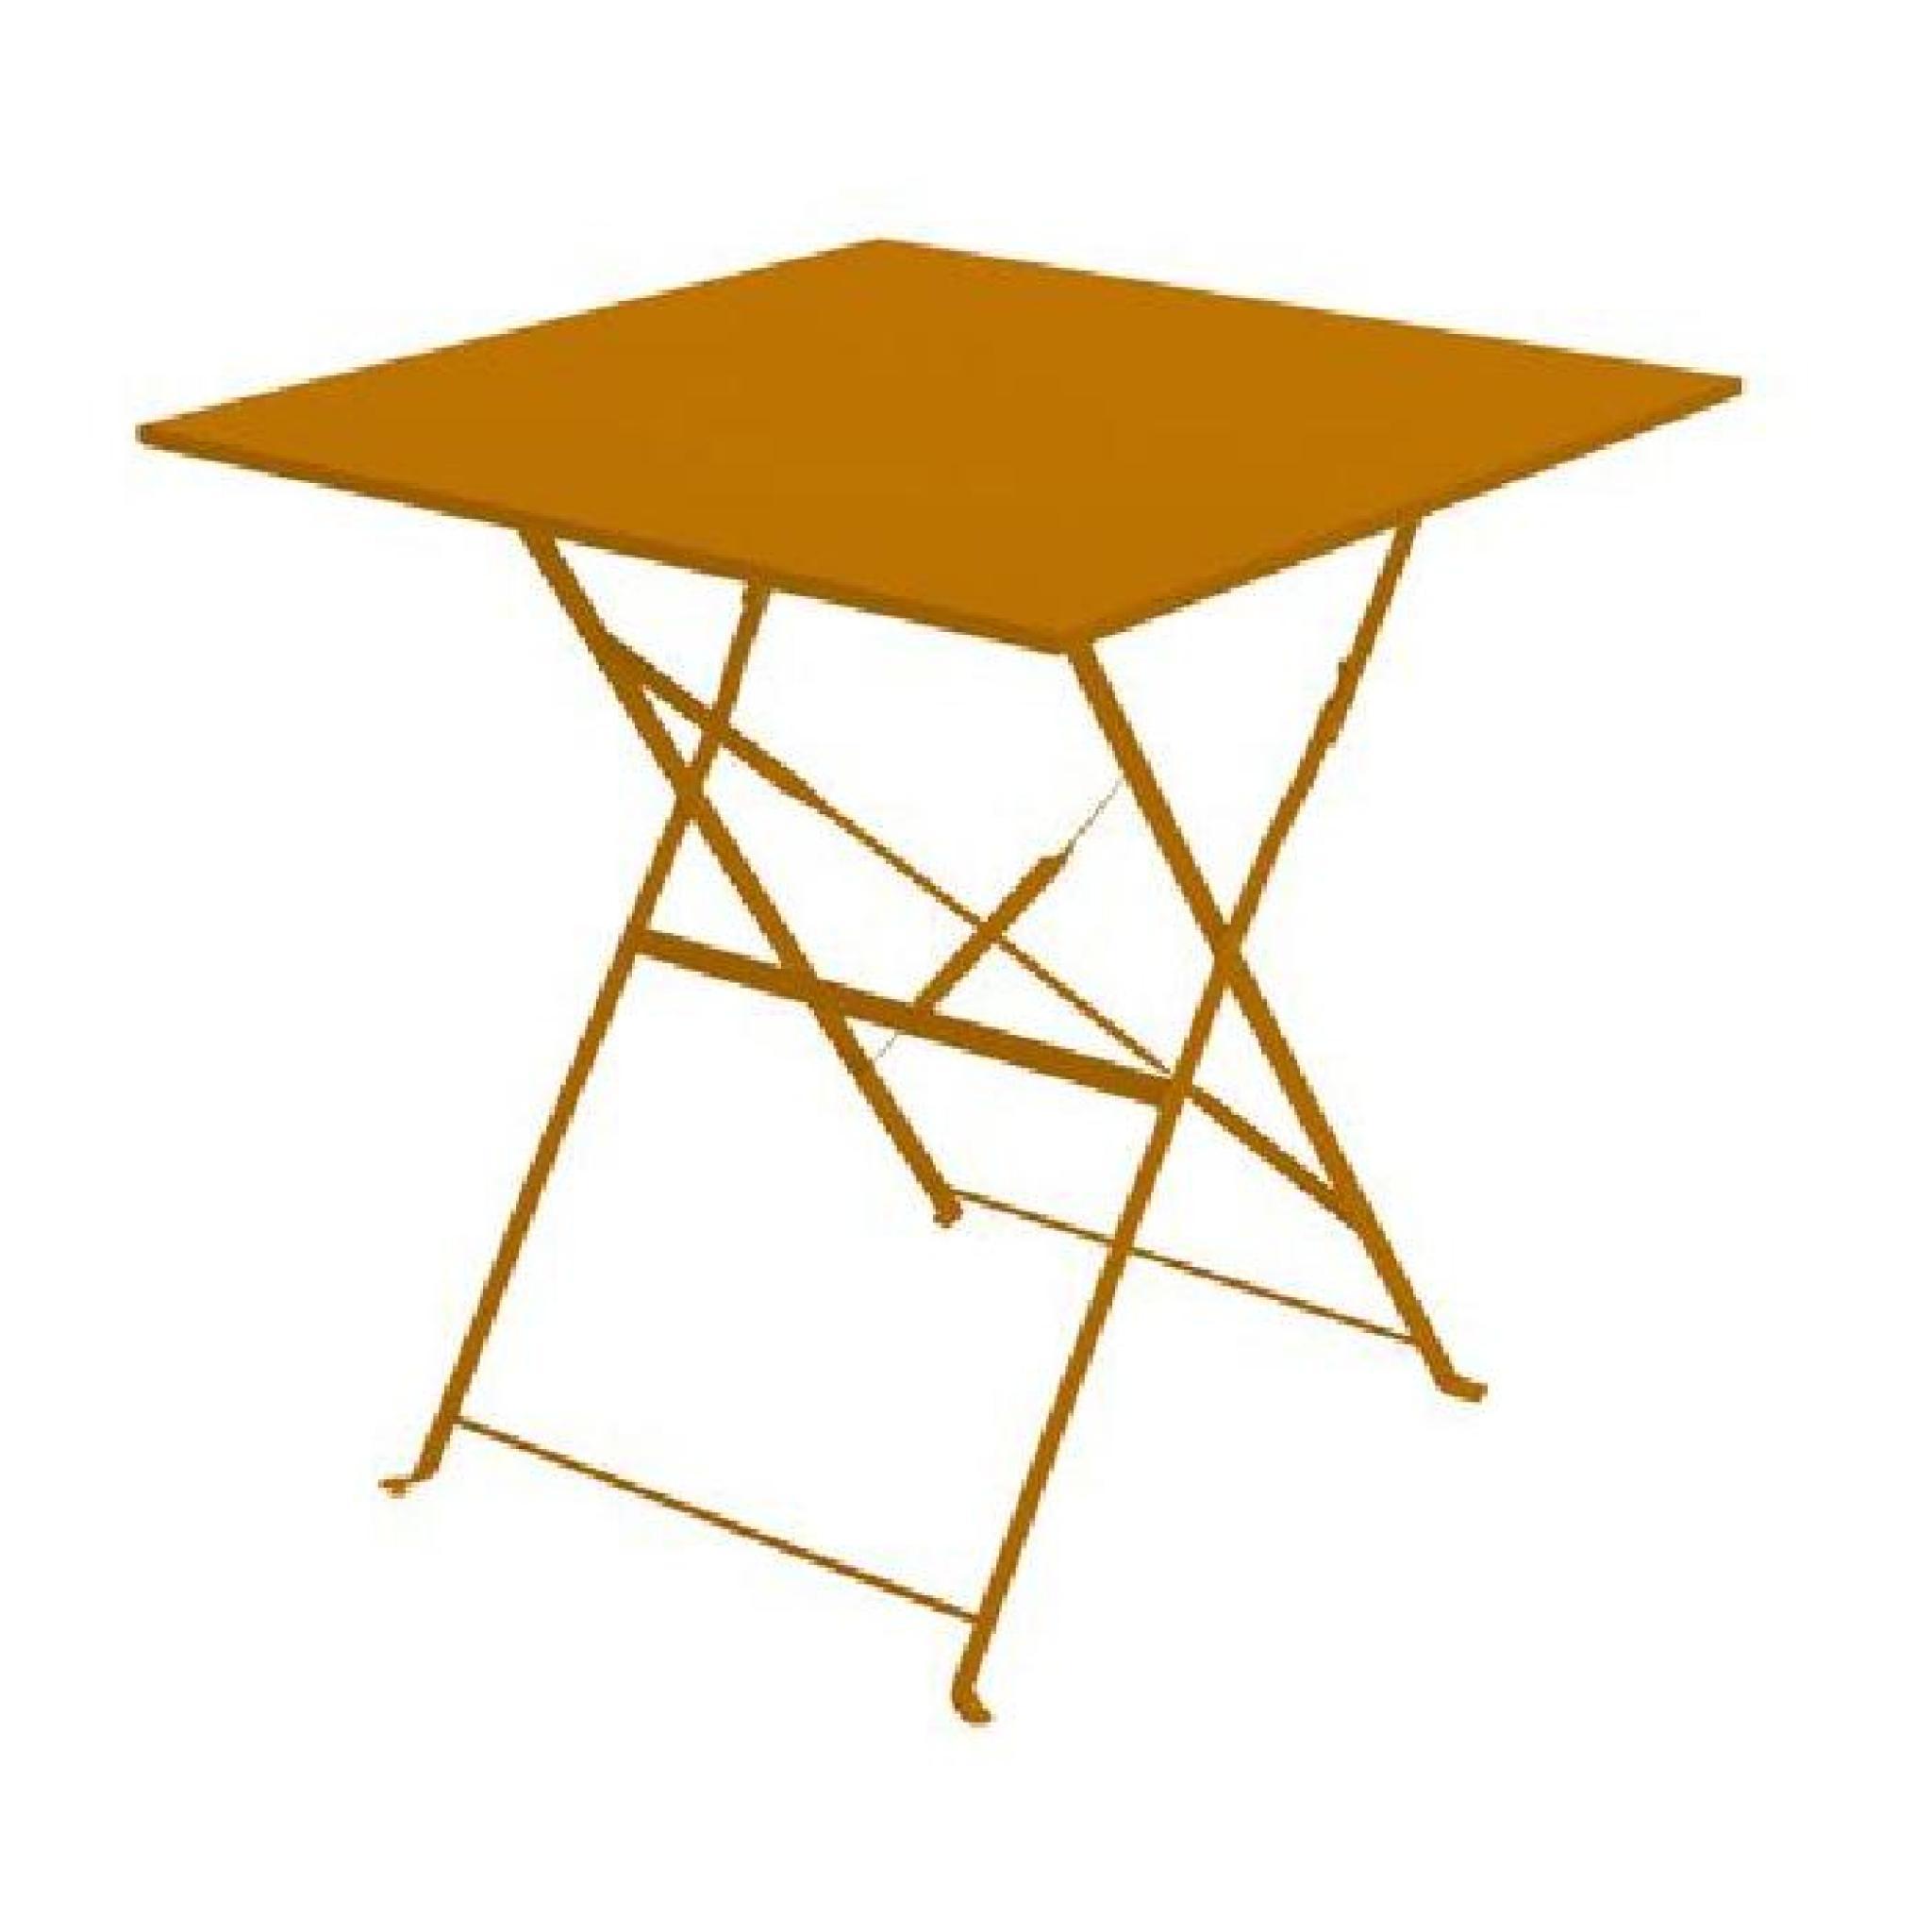 70cm Camargue de x Orange 110 pliante Table jardin 92WDEHI